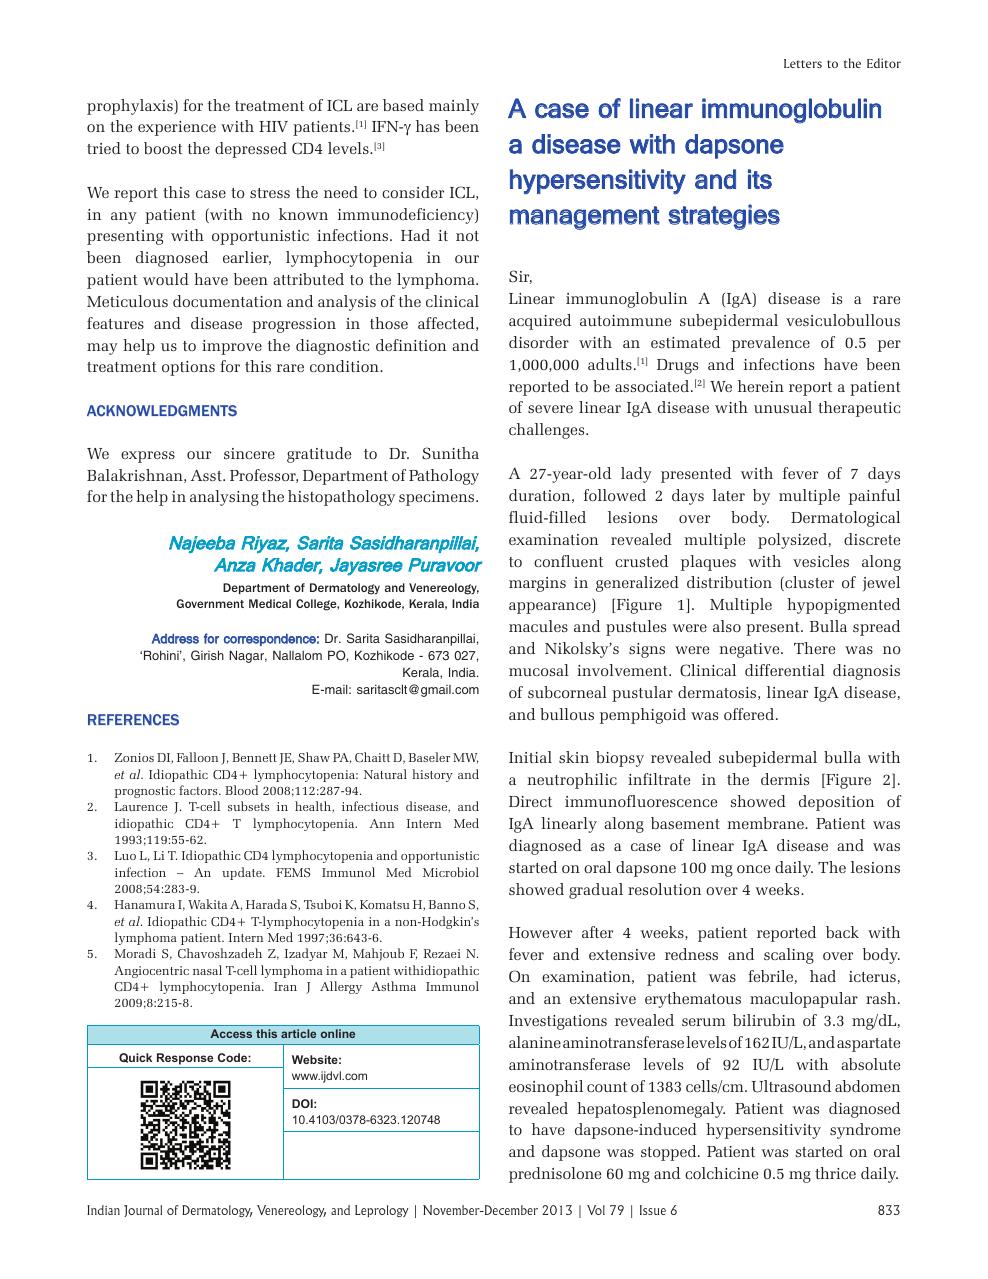 A case of linear immunoglobulin A disease with dapsone